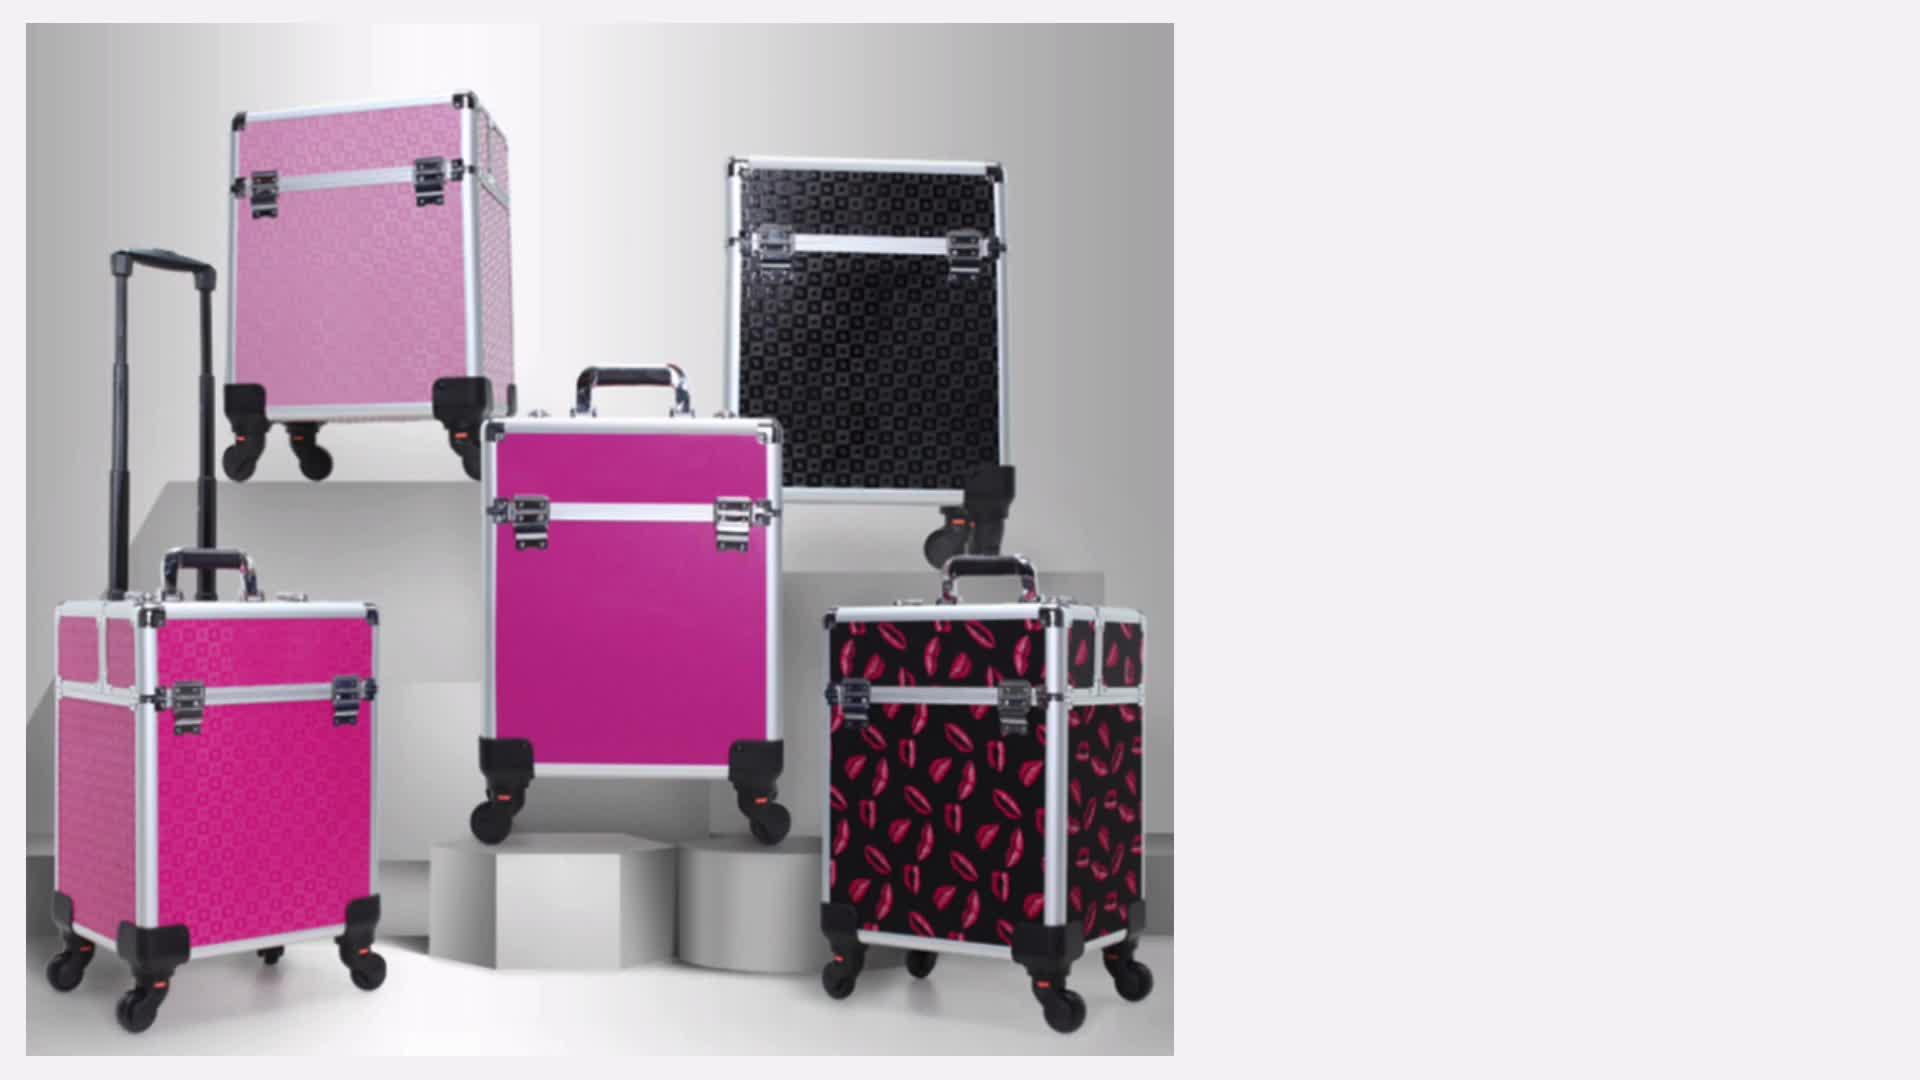 wholesale Professional Portable Aluminum cosmetic vanity case trolley box makeup train case